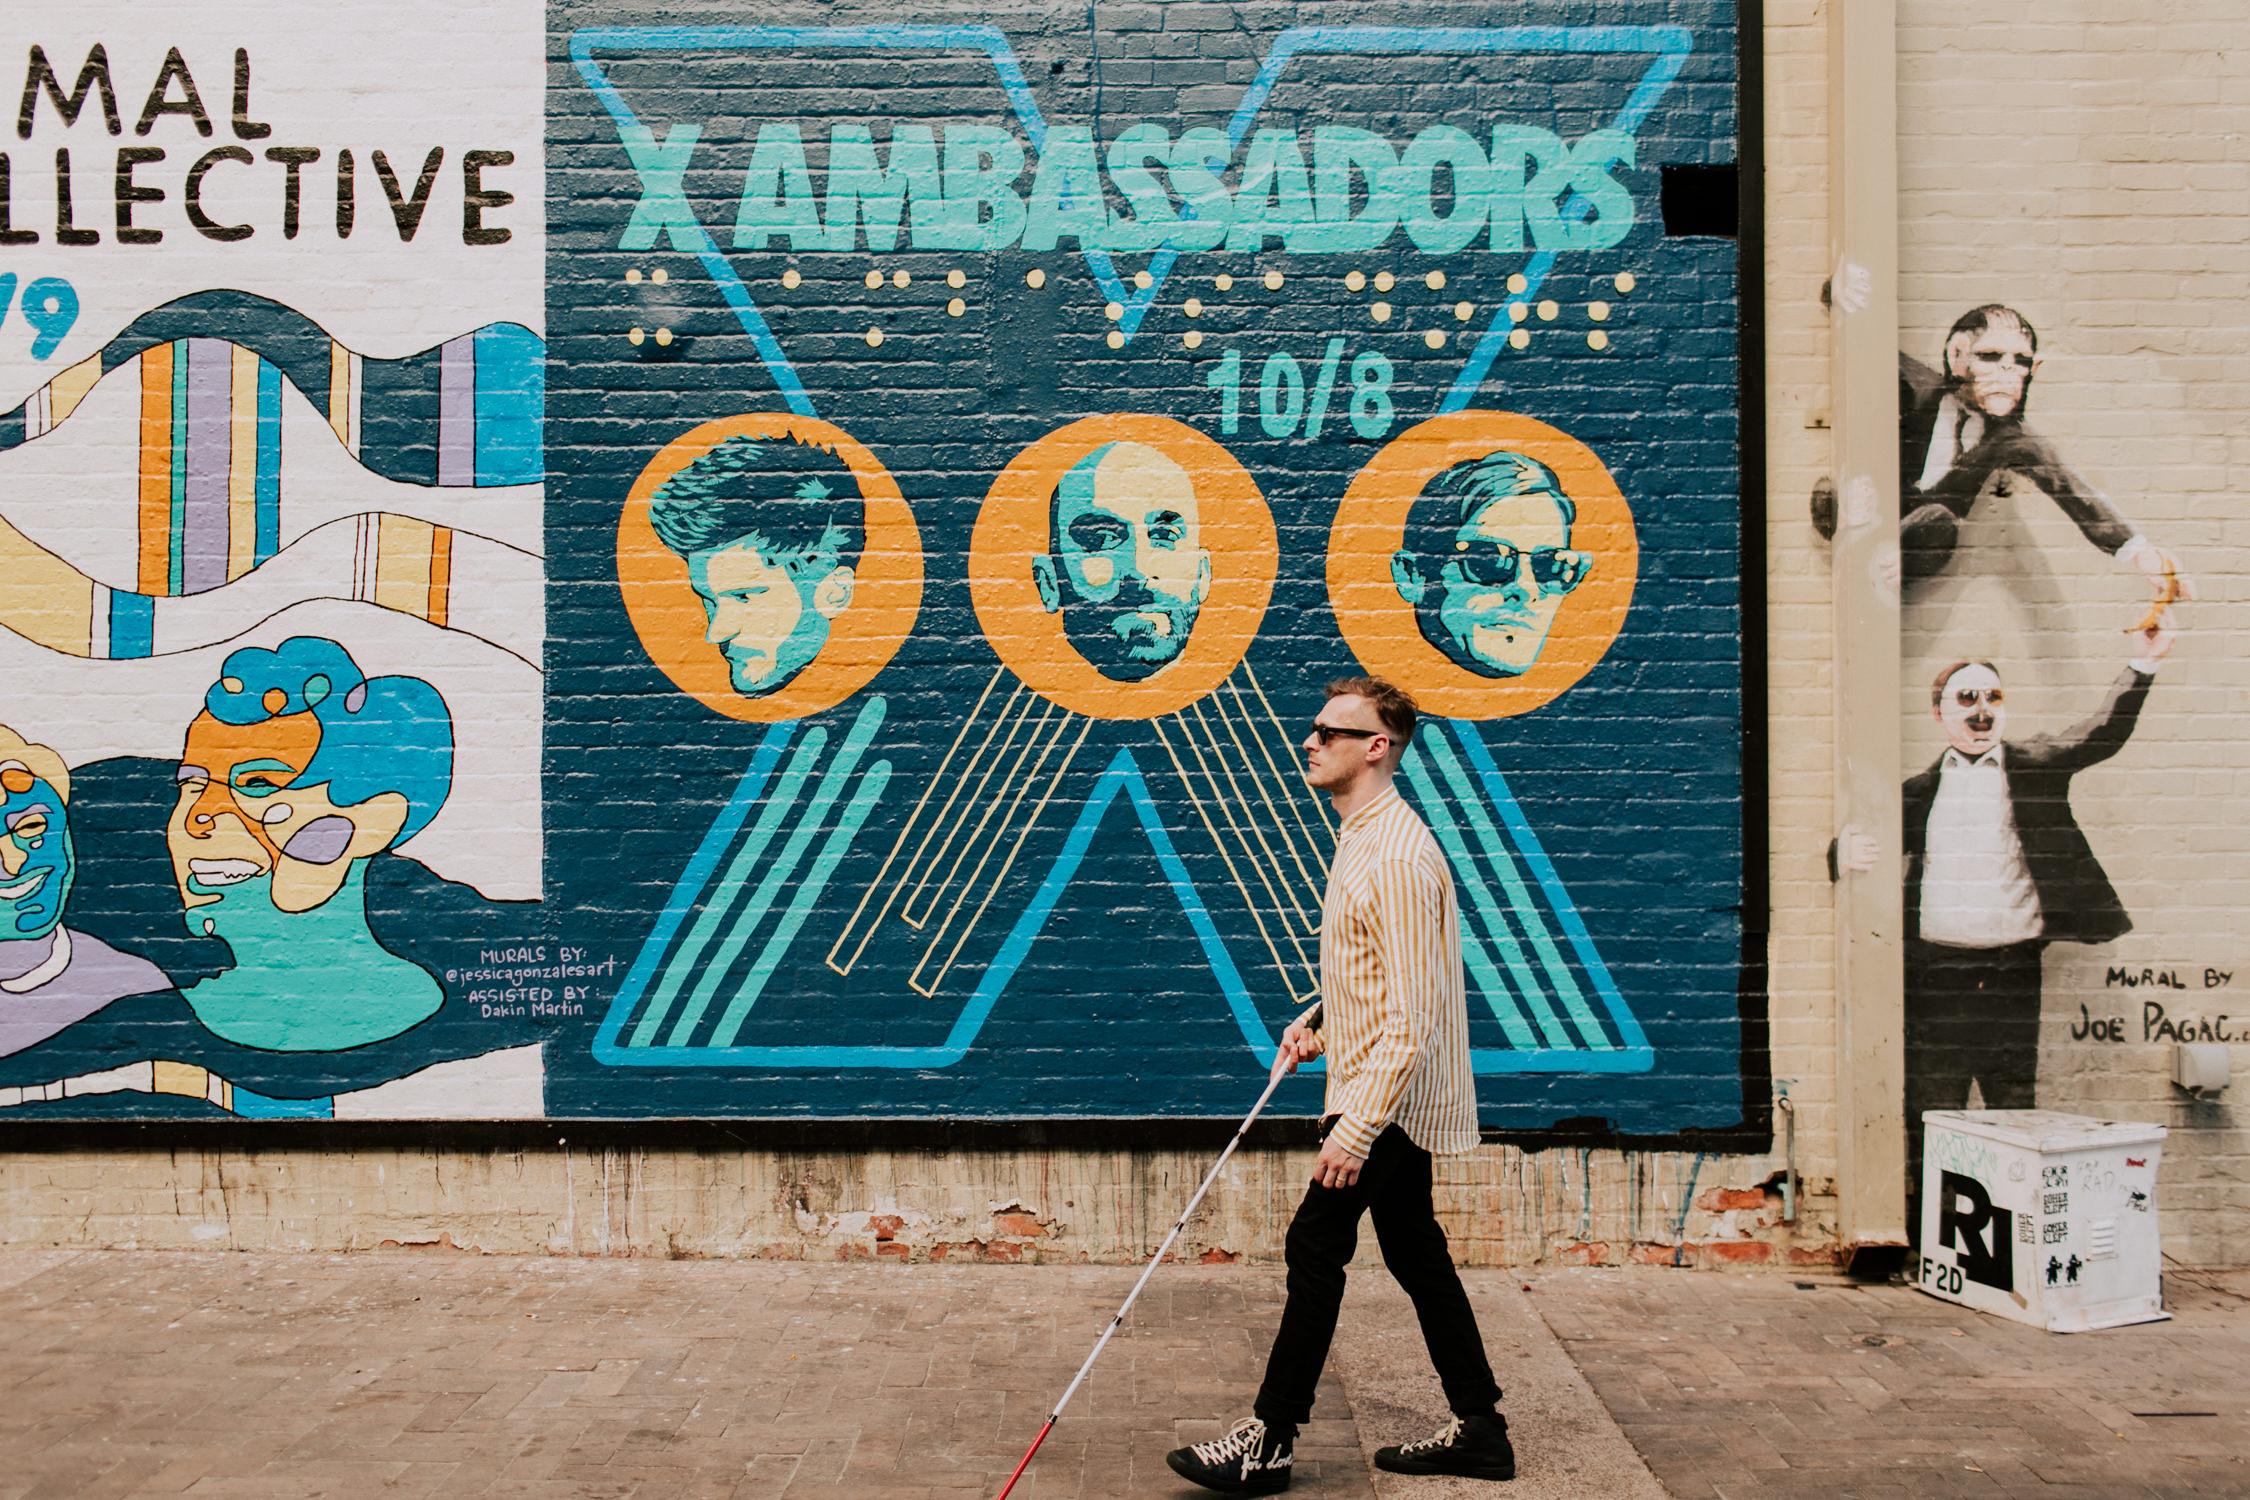 casey-harris-walking-by-mural-x-ambassadors-AnnaLeeMedia